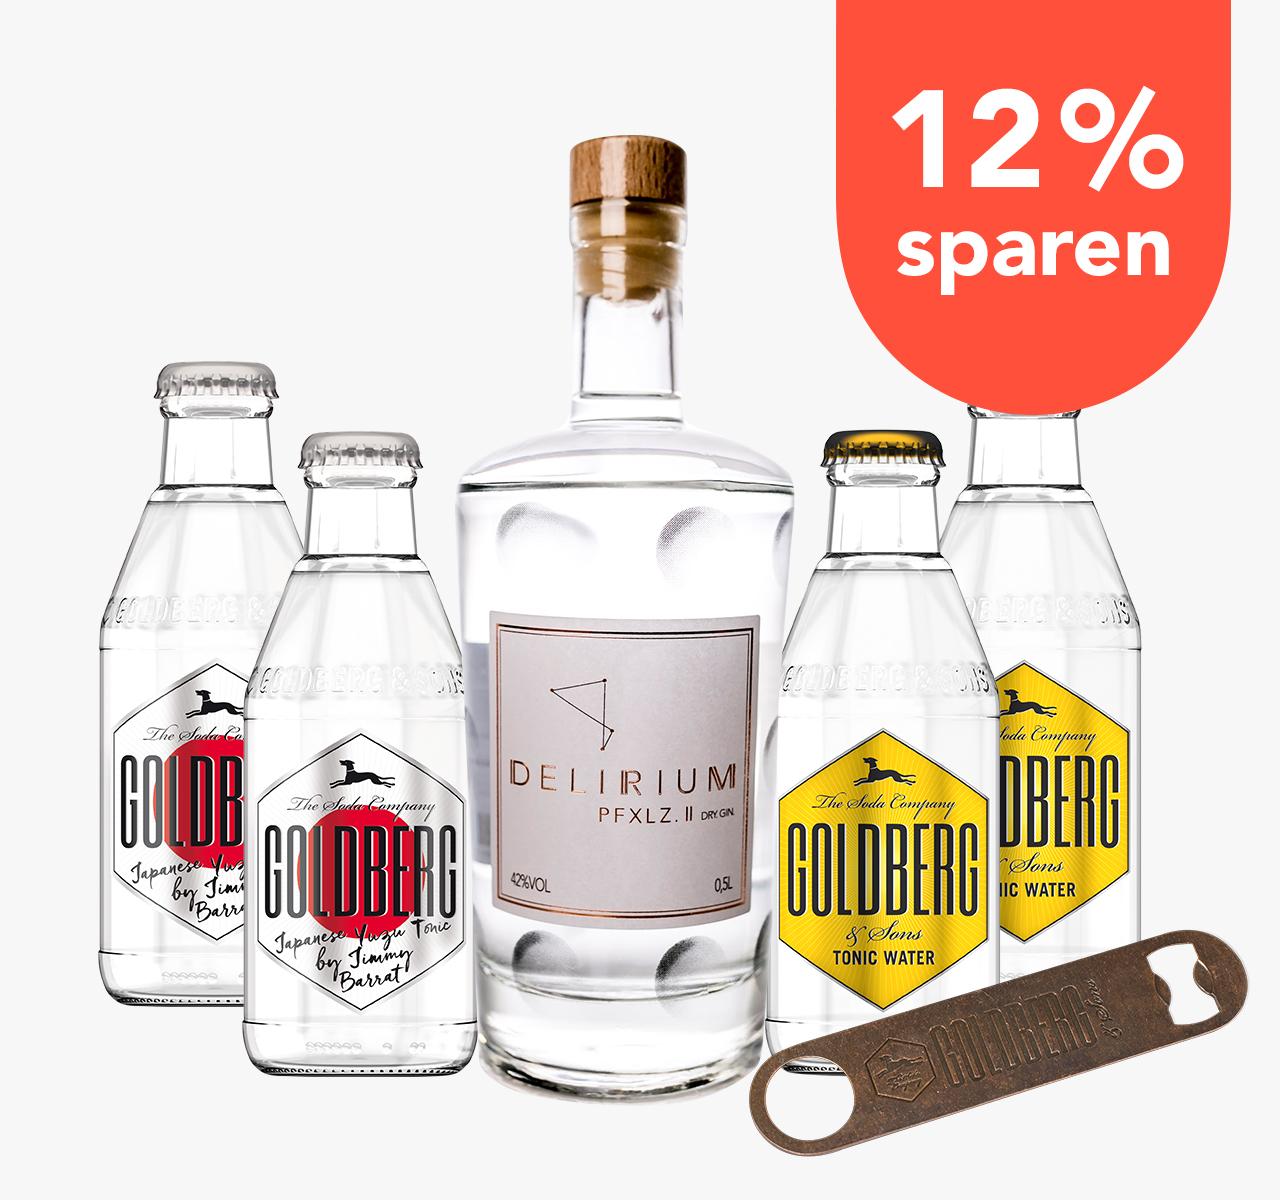 [Foodist] Delirium Pfxlz Pfalz II Dry Gin 42% 0,5l + 4x Goldberg Tonic 0,2 (2x Yuzu, 2x Normal) + Flaschenöffner